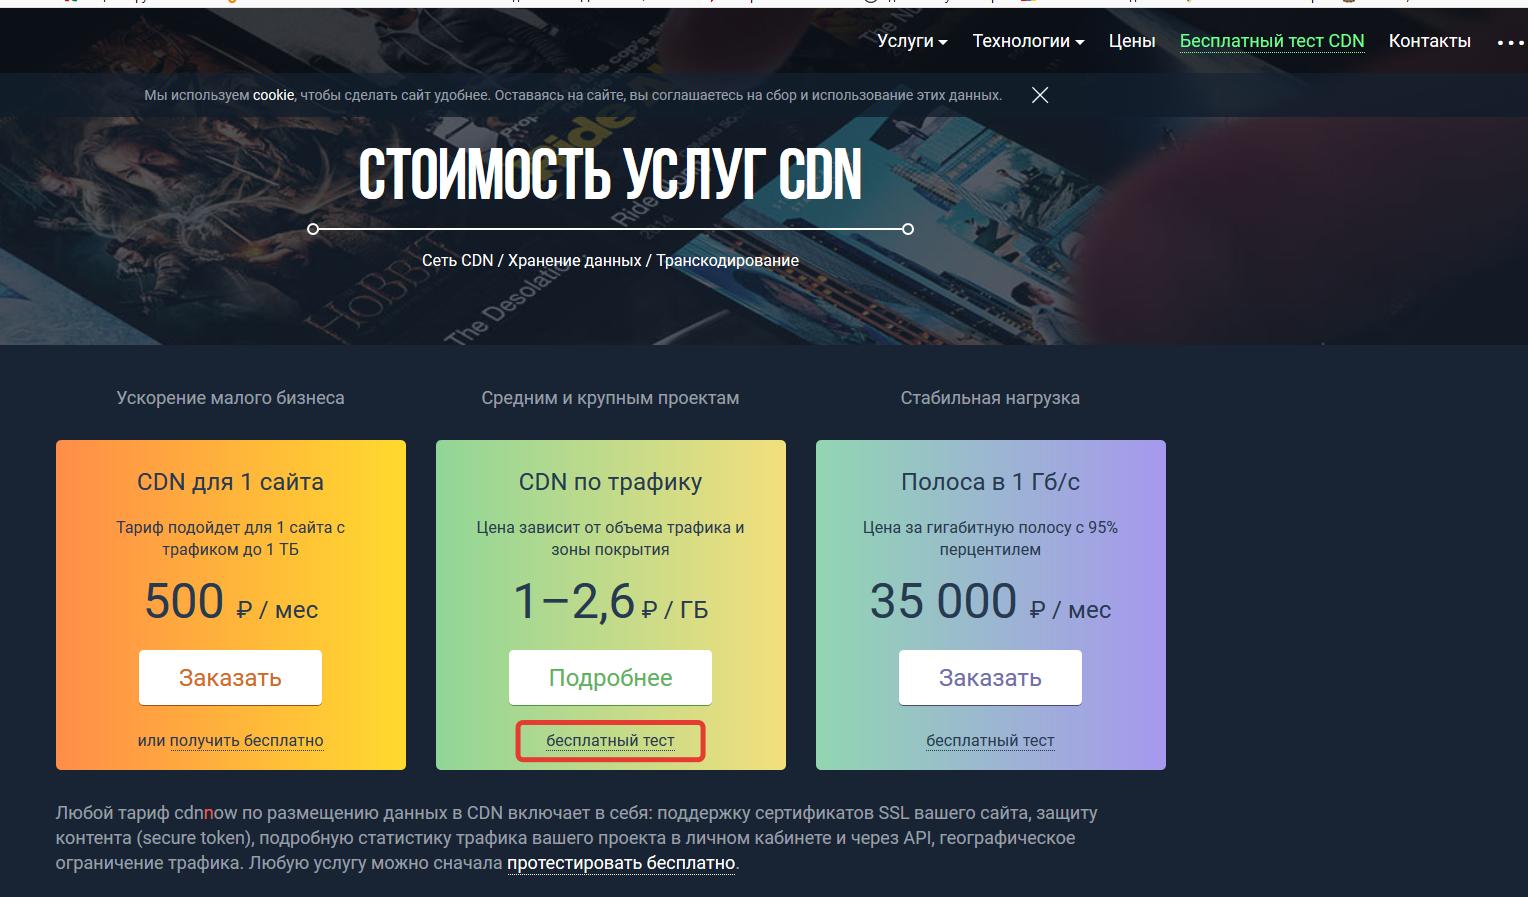 cdnnow.ru/price/